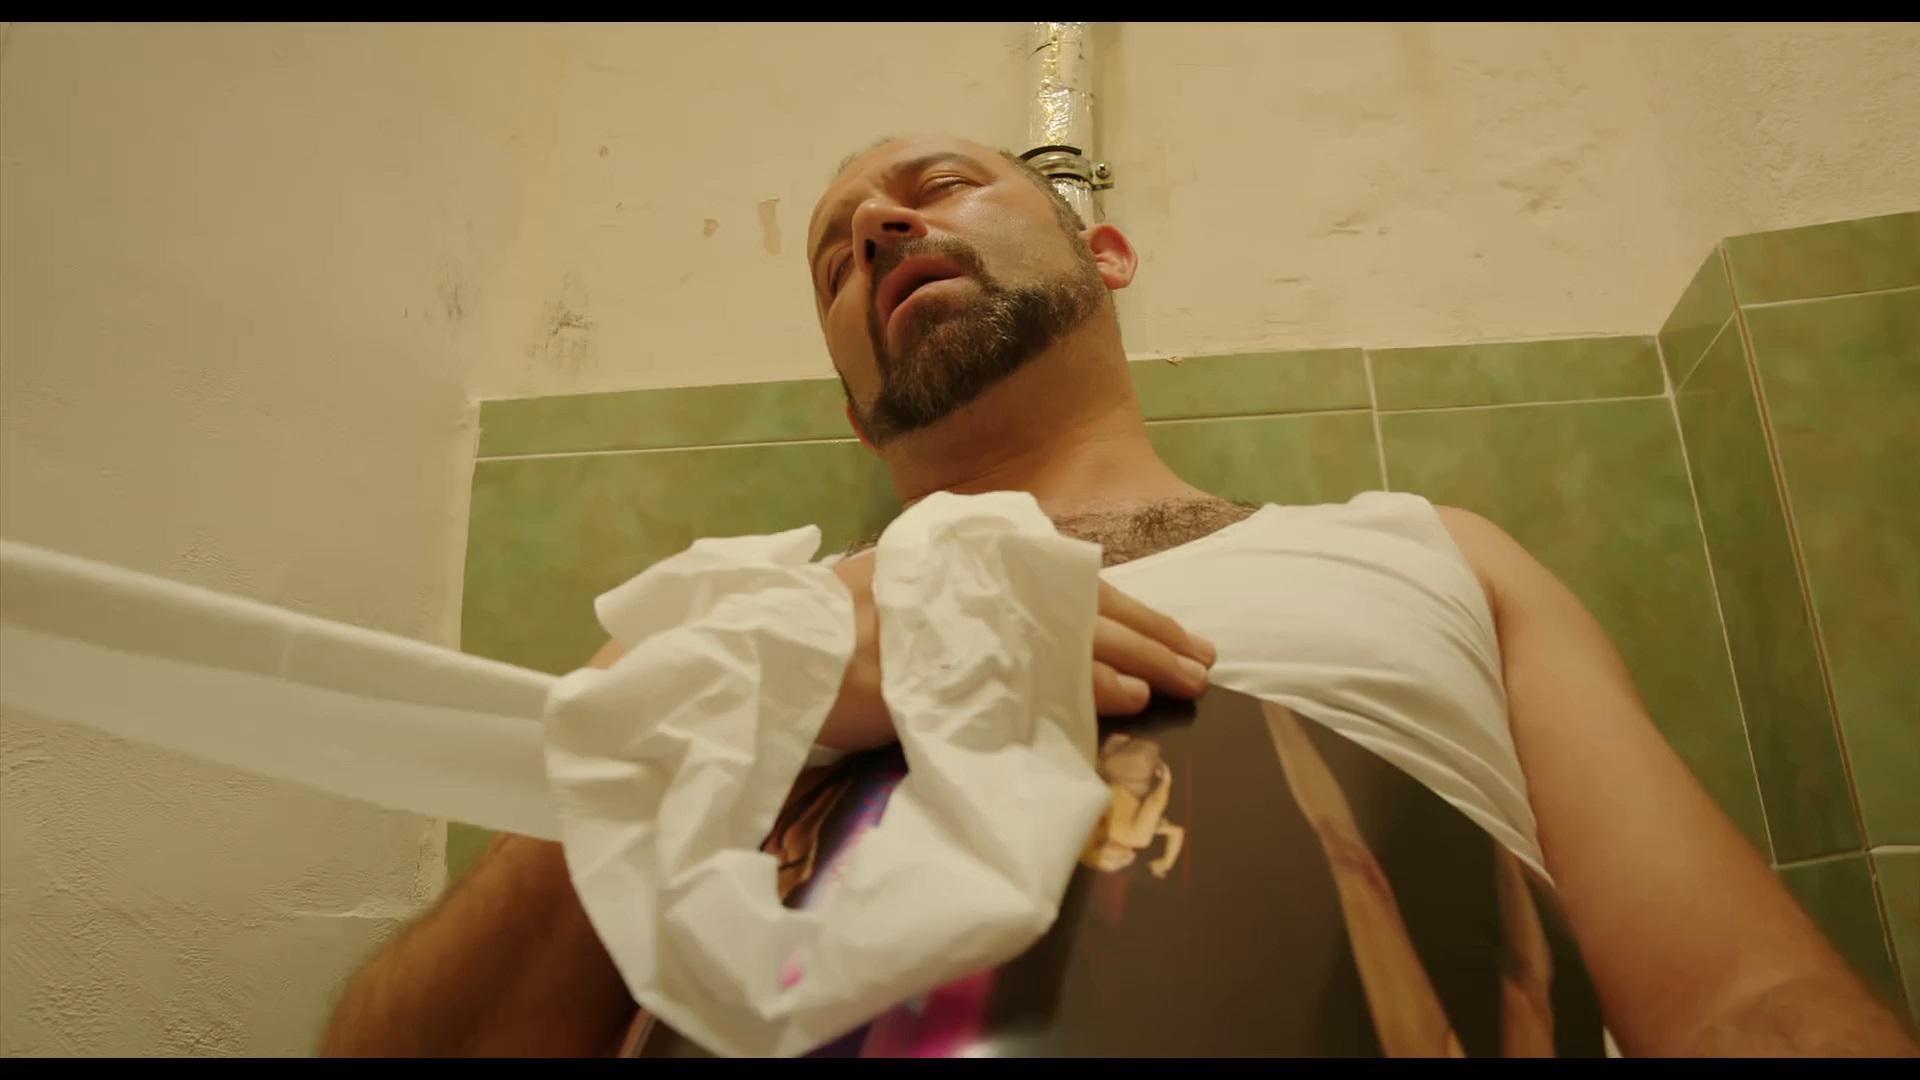 Çakallarla Dans   1-2-3-4-5   Yerli Film   NF   BoxSet   1080p   WEB-DL   Sansürsüz   Tek Link